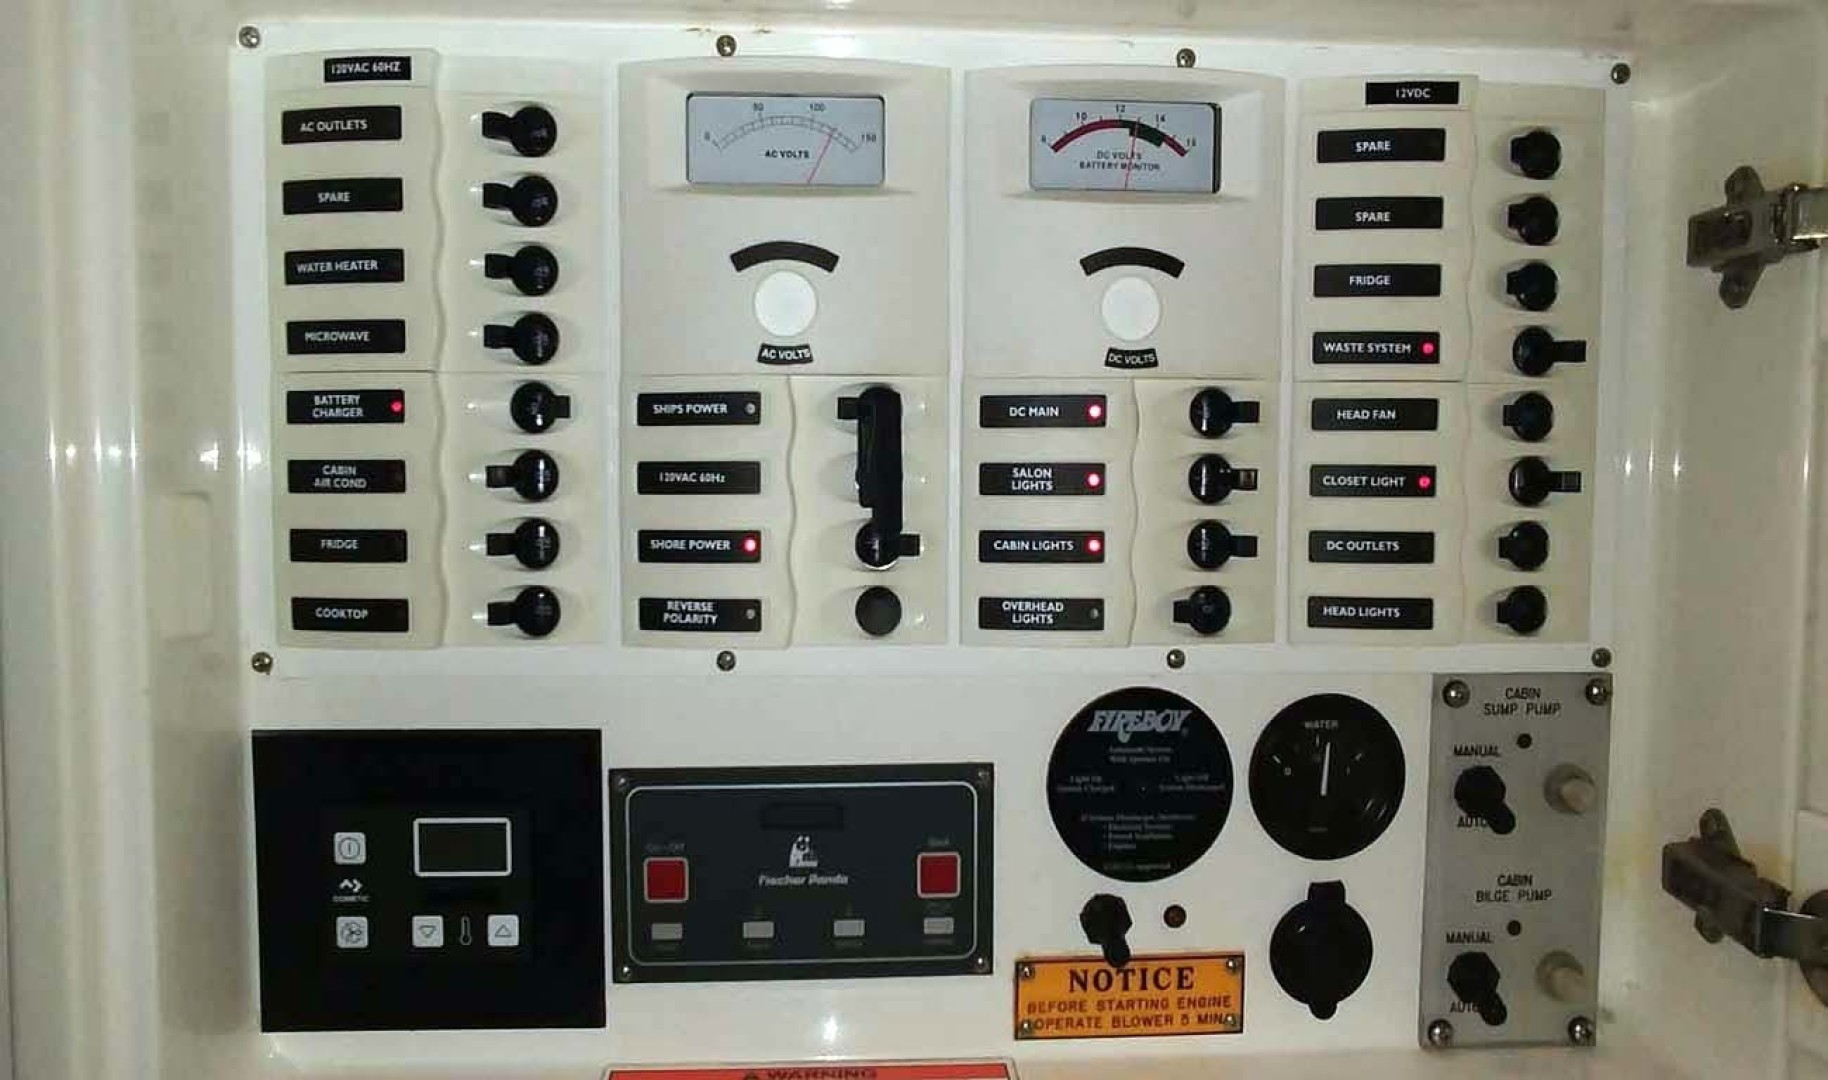 Intrepid-377 Walkaround 2006 -Pompano Beach-Florida-United States-Electrical Panel-1322766 | Thumbnail